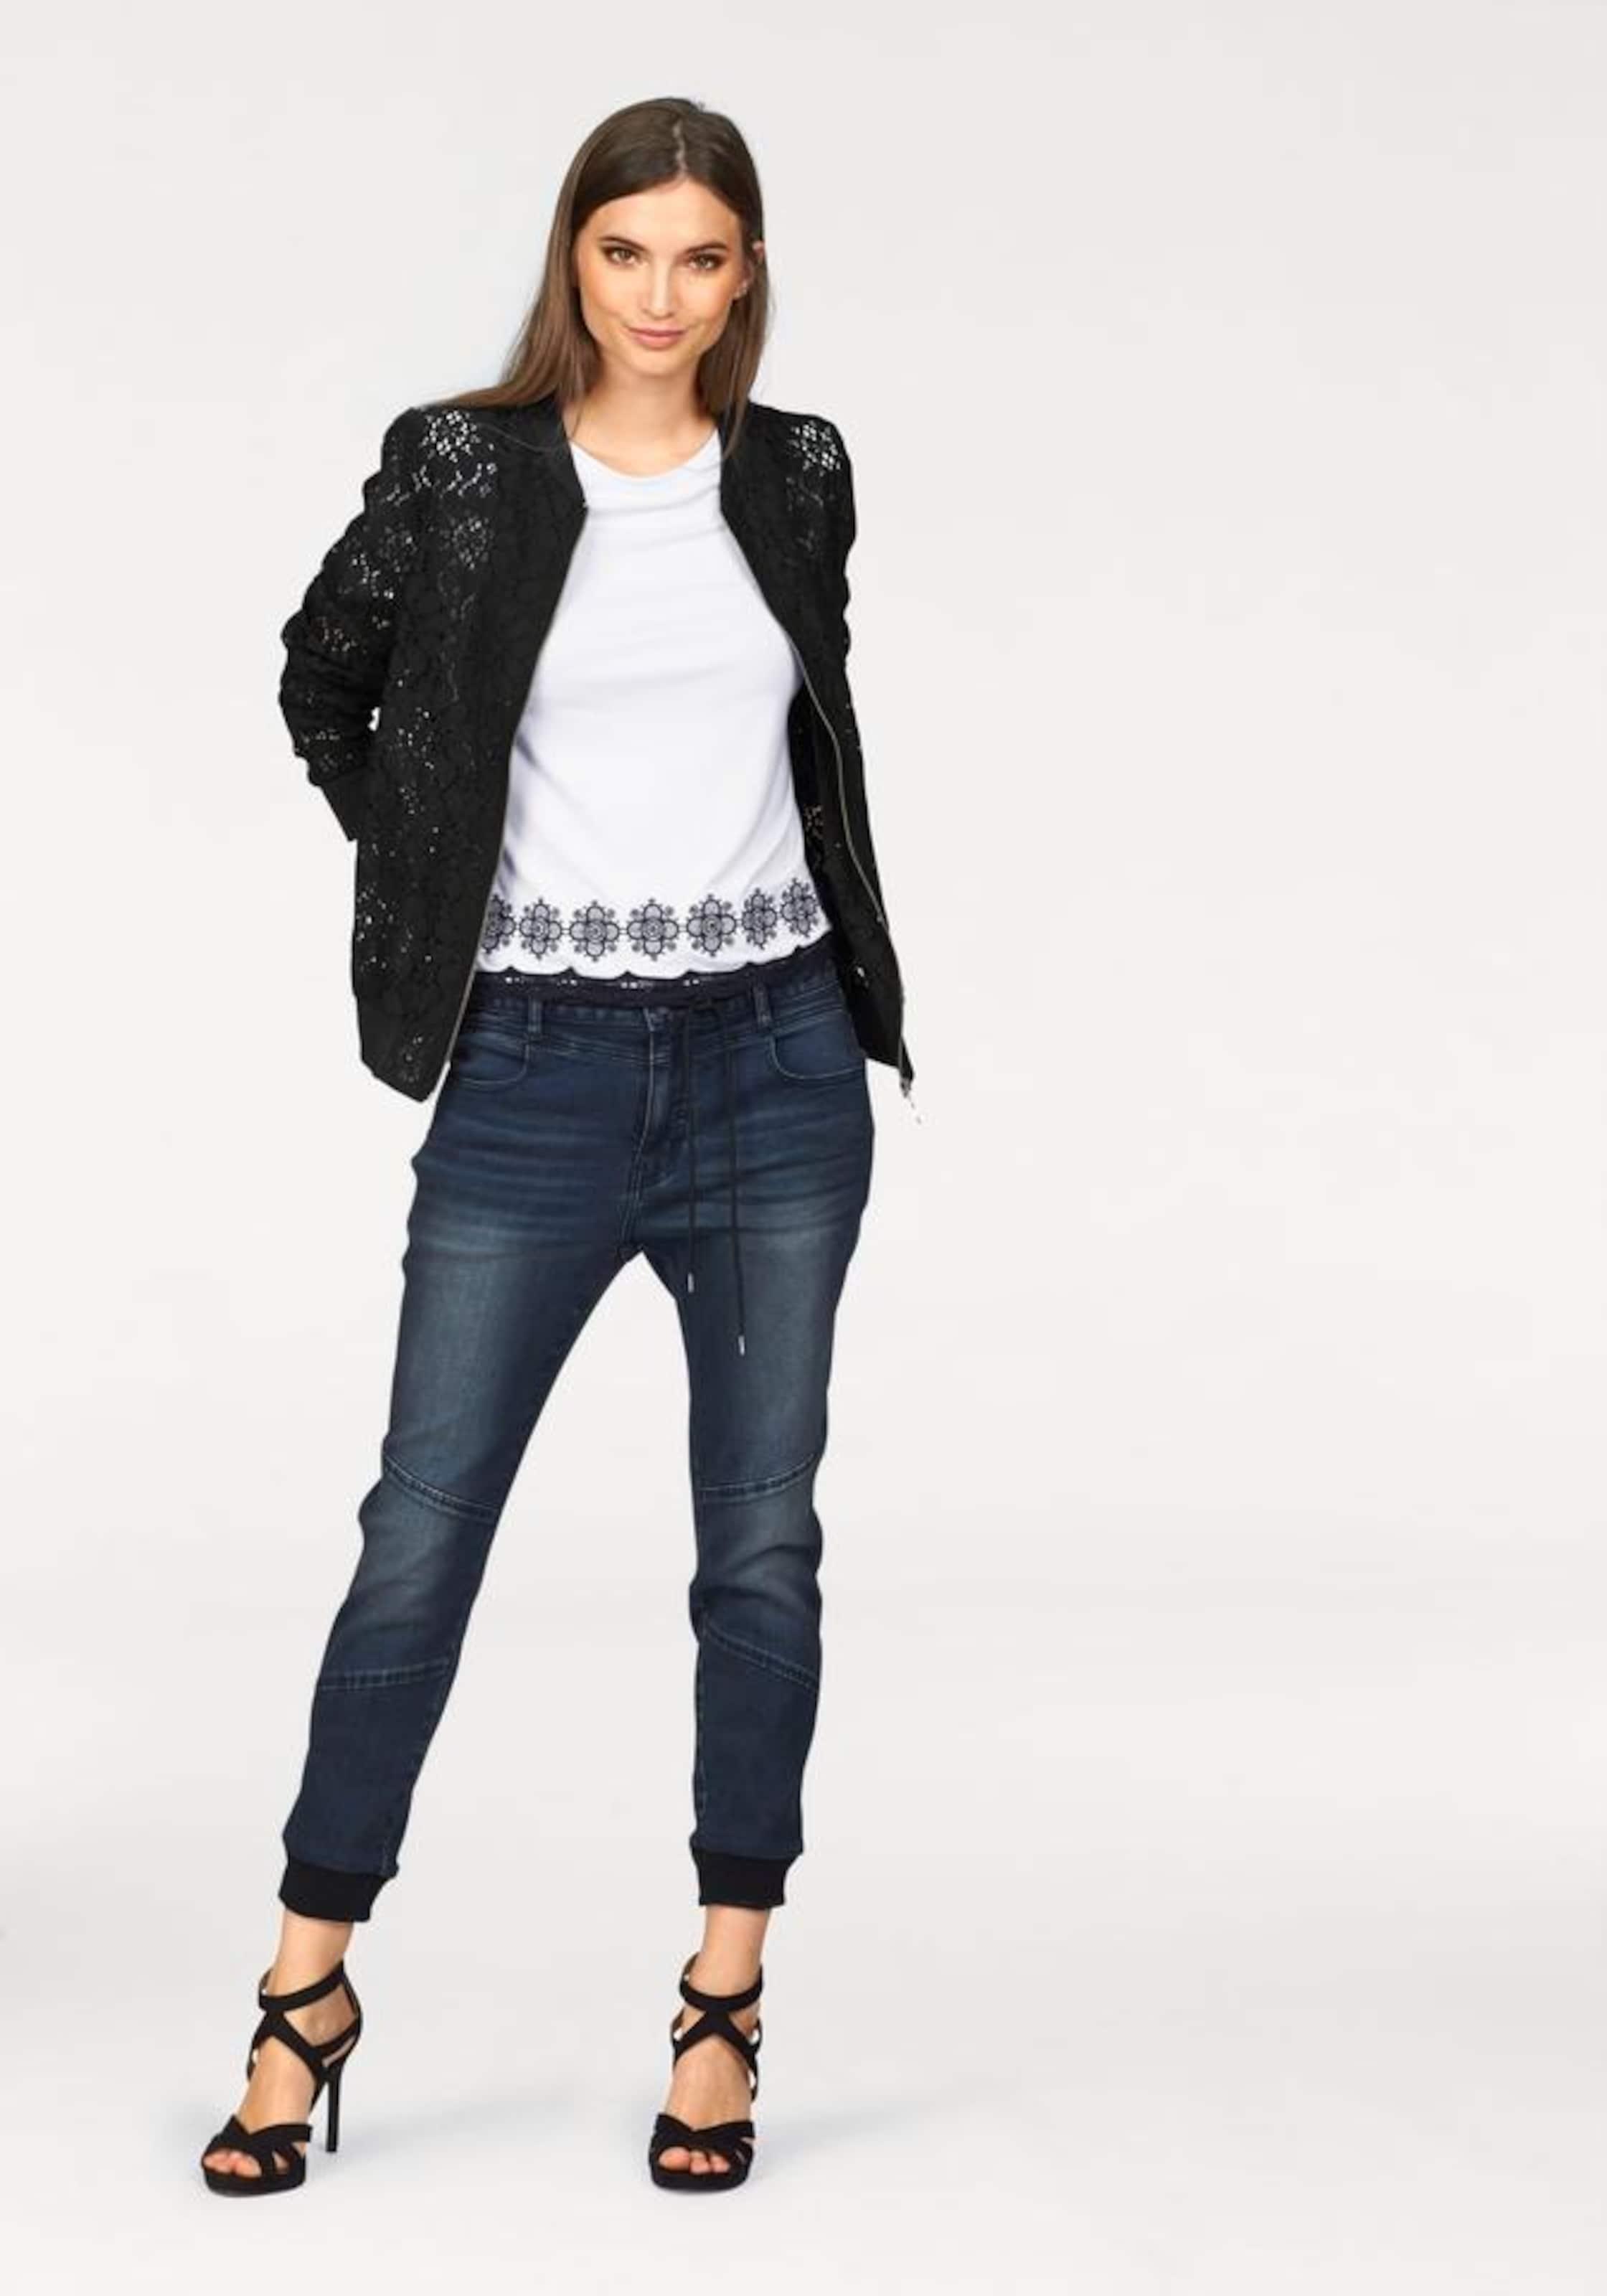 LAURA SCOTT T-Shirt Billig Erstaunlicher Preis SRJV2rXqLy